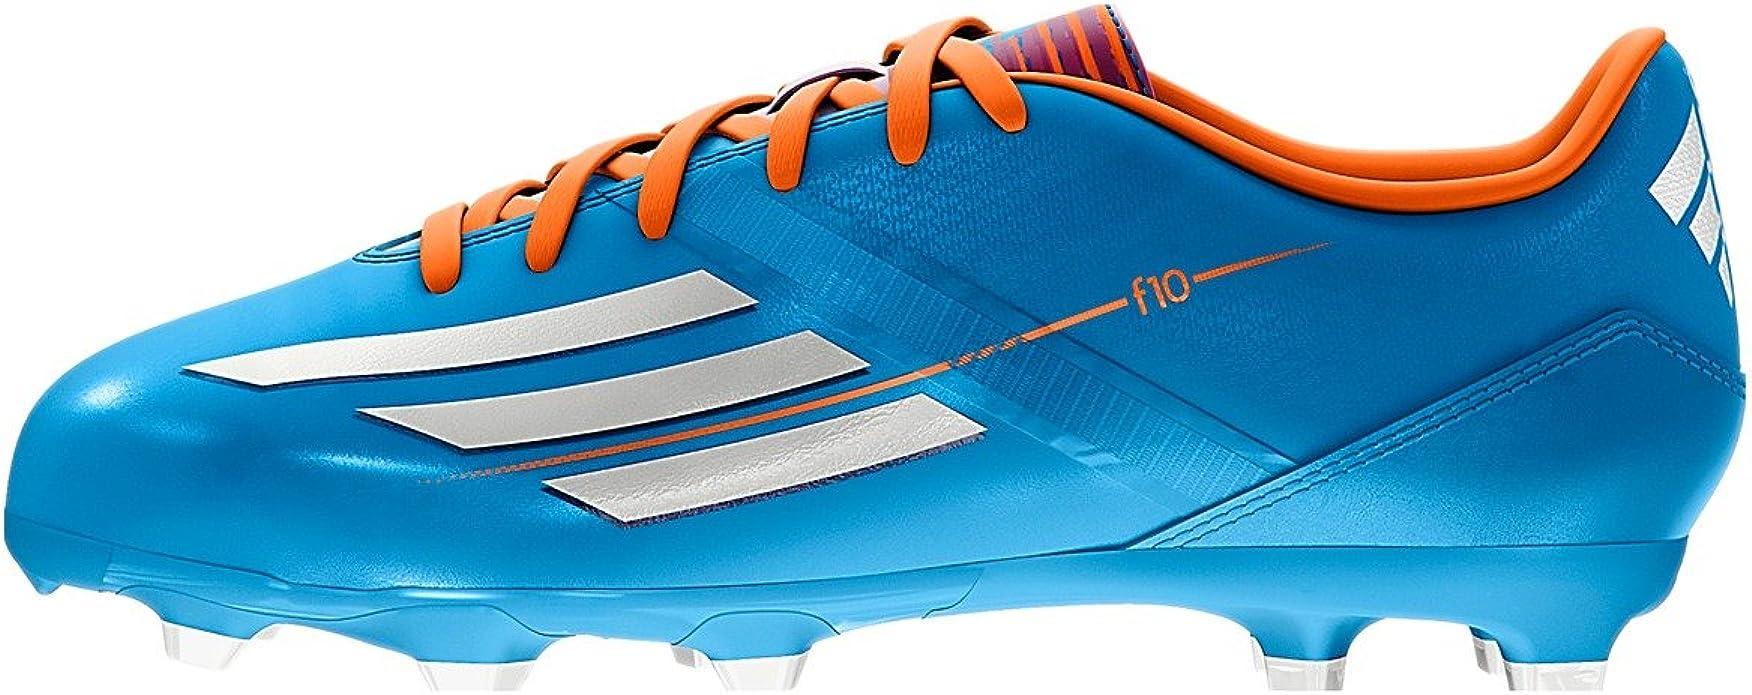 adidas F10 TRX FG Soccer Cleats - Blue